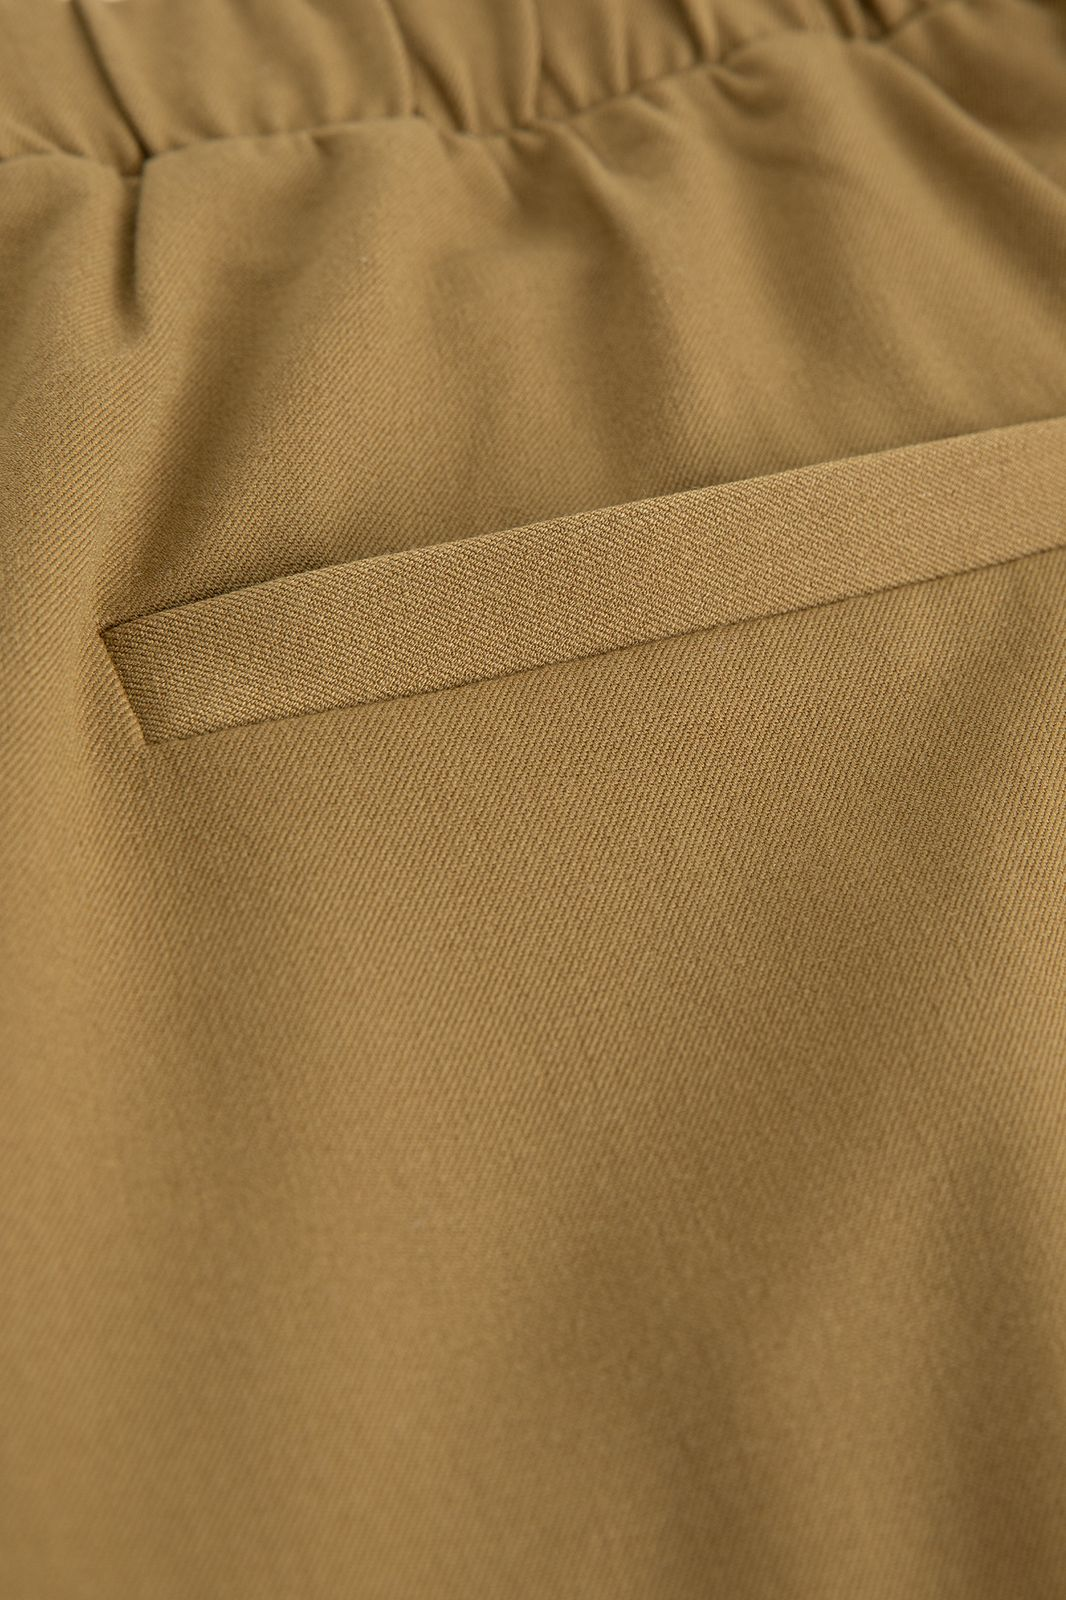 Minimum broek sofja e54 bruin - Dames   Sissy-Boy